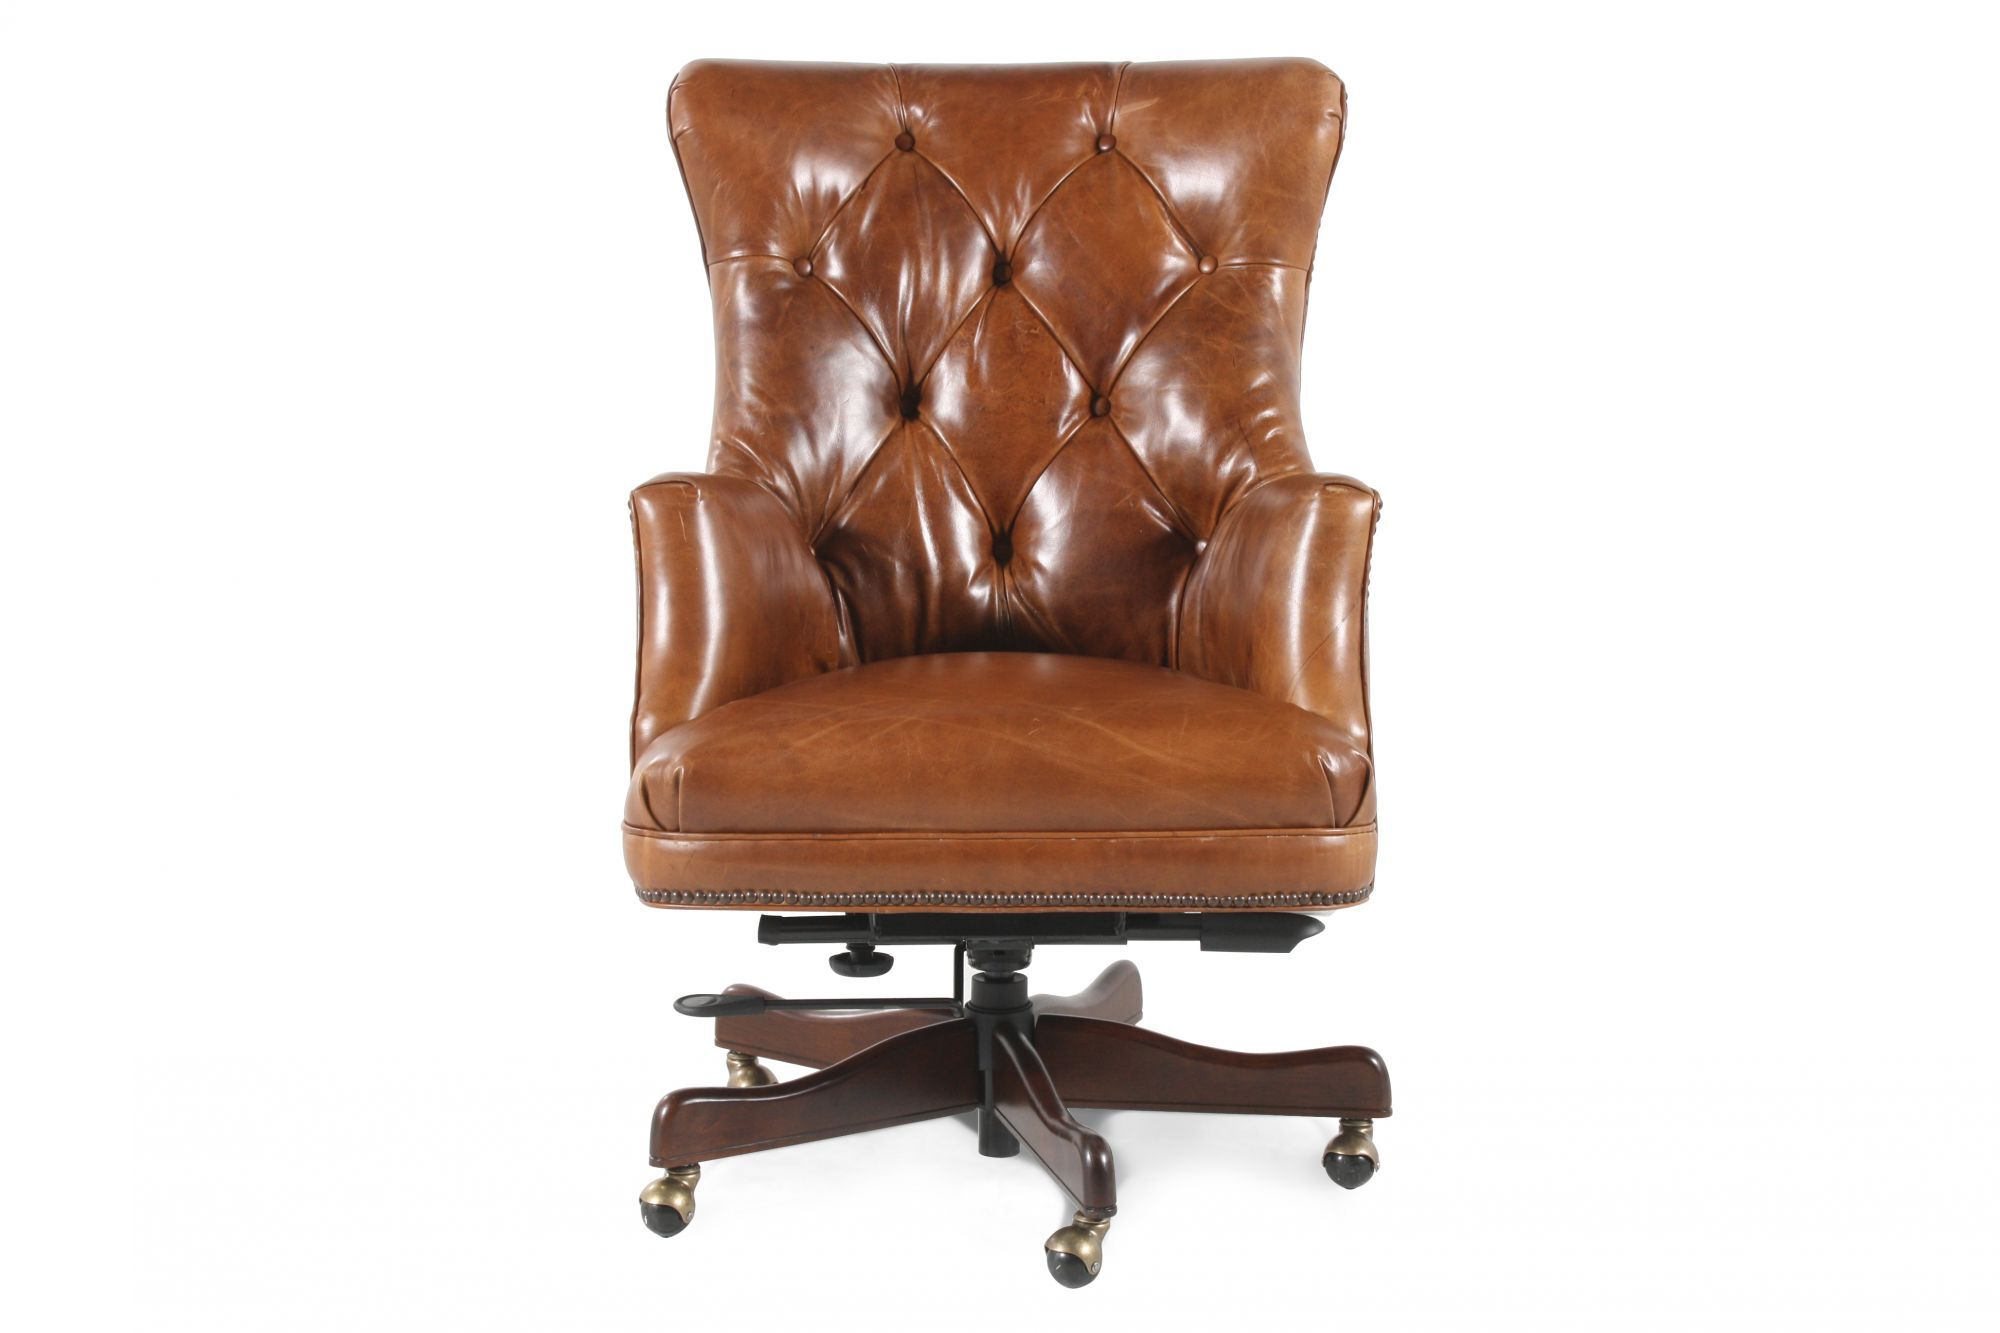 Leather Tufted Executive Swivel Tilt Chairu0026nbsp;in Medium Brown